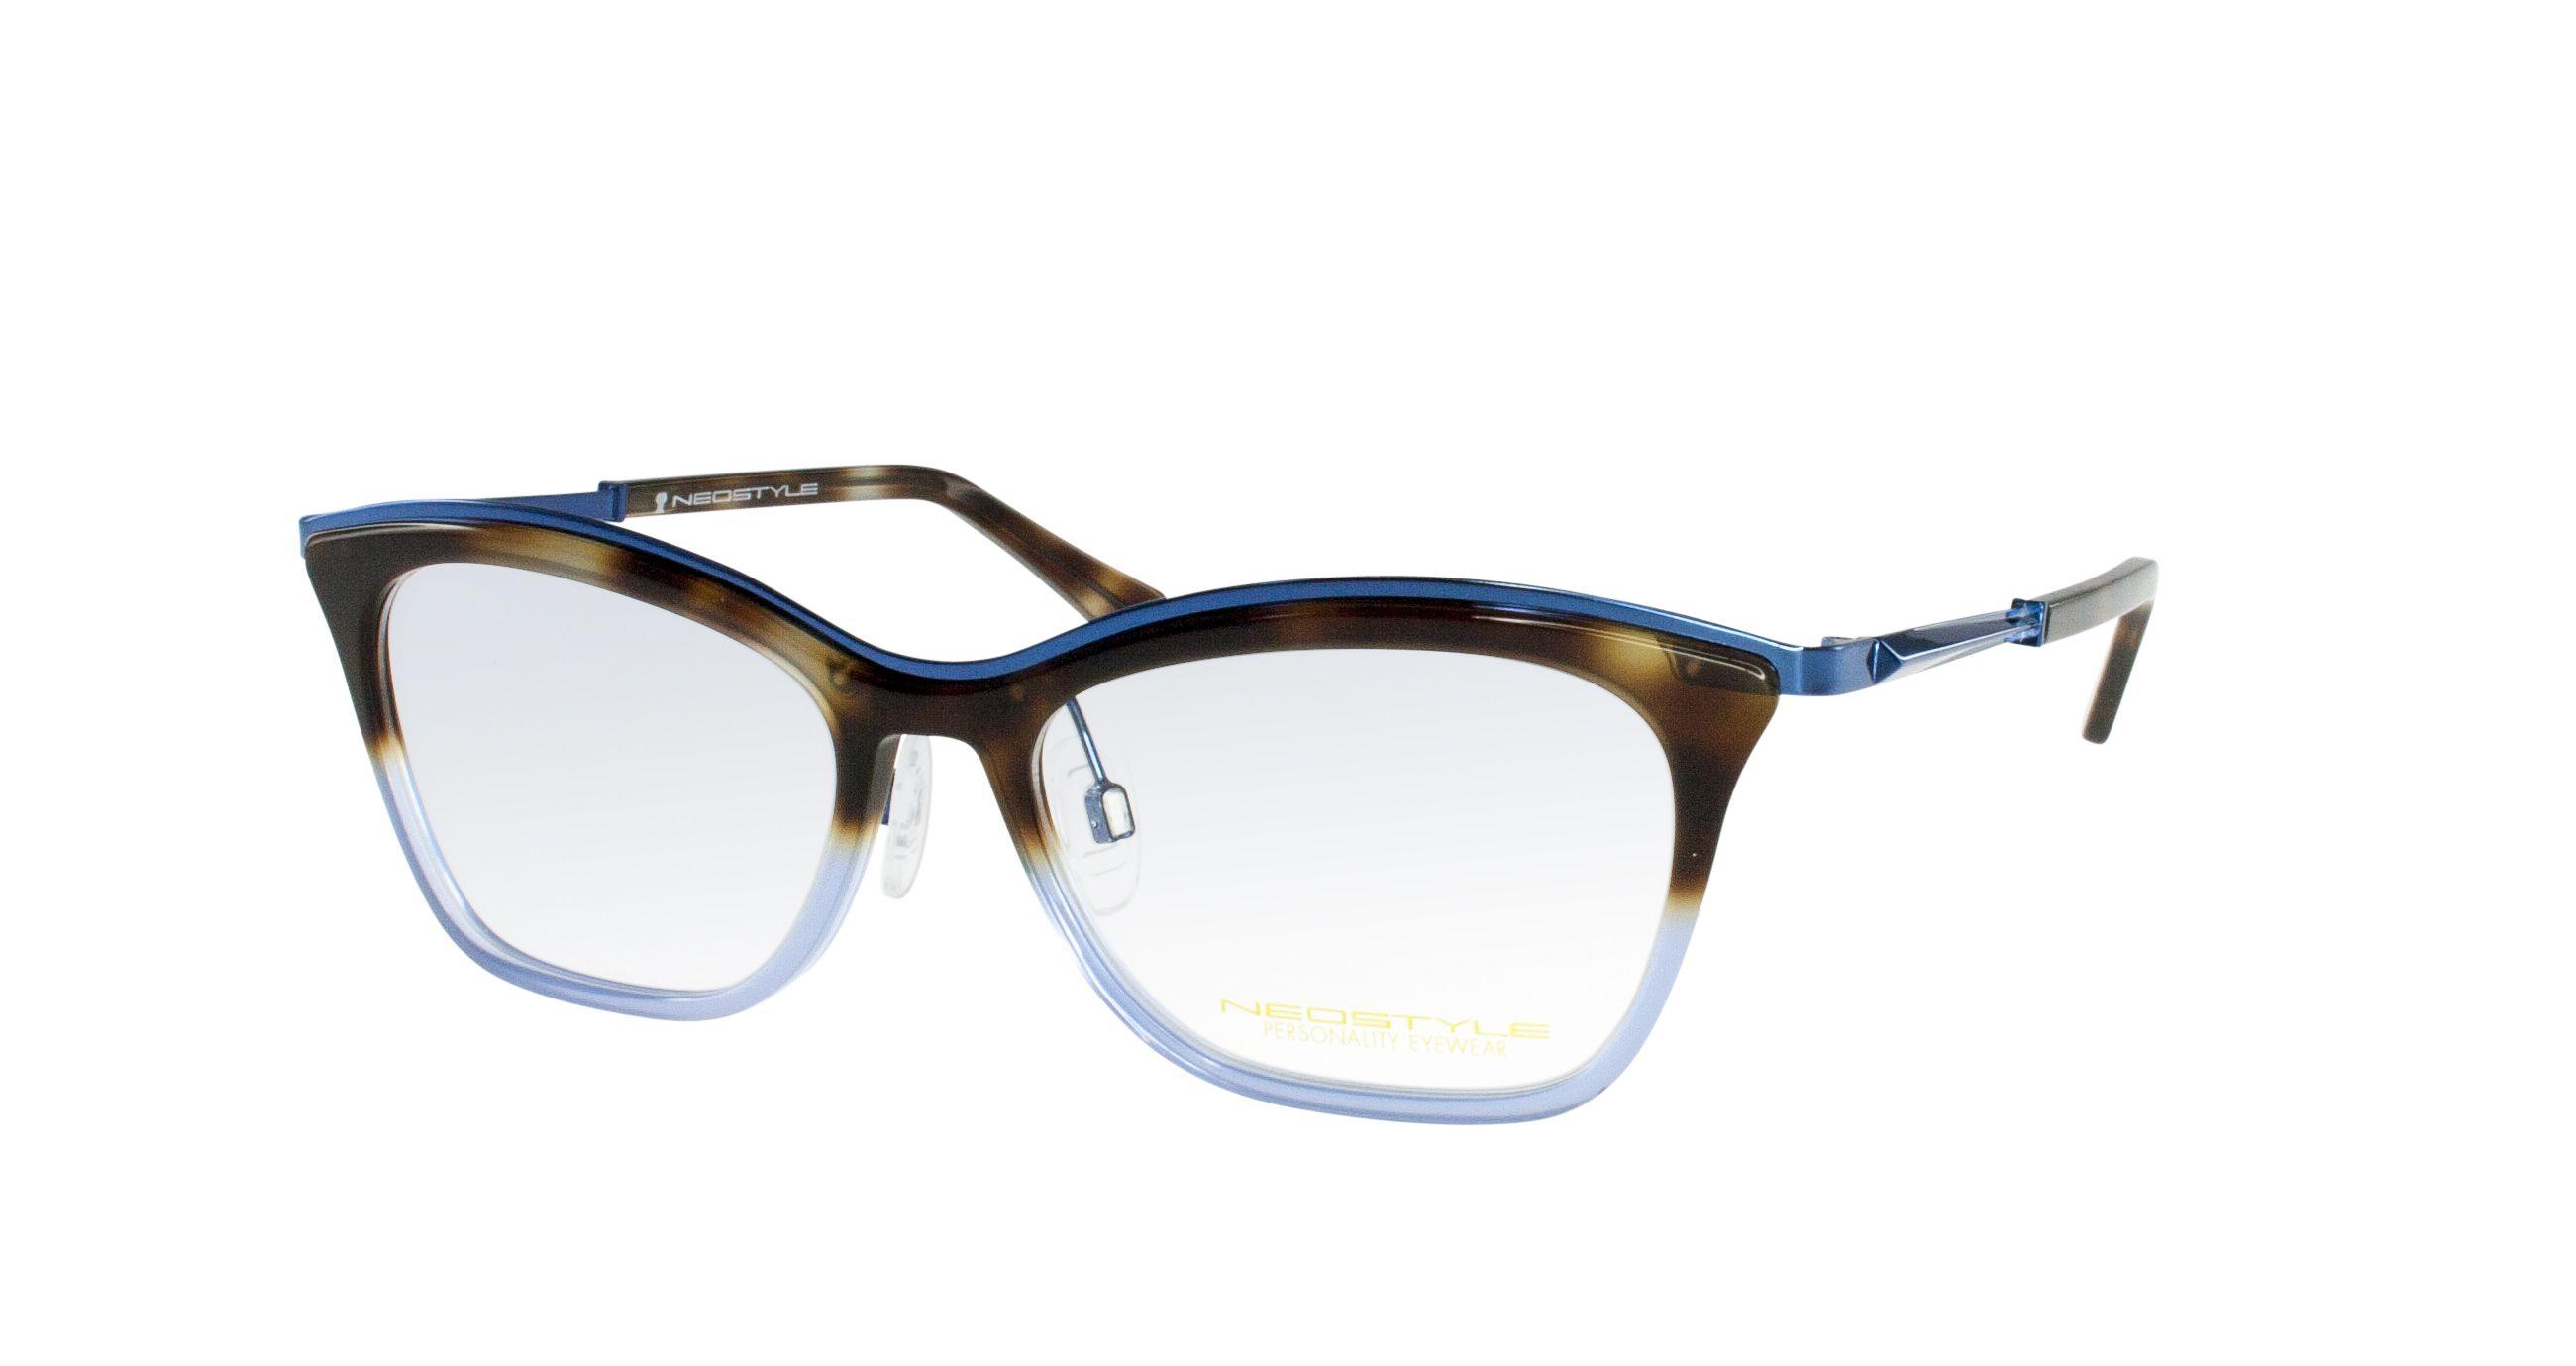 73 Silmo Neostyle Zodiac 2016 604 ByPop'up Eyeglasses DIE9W2H